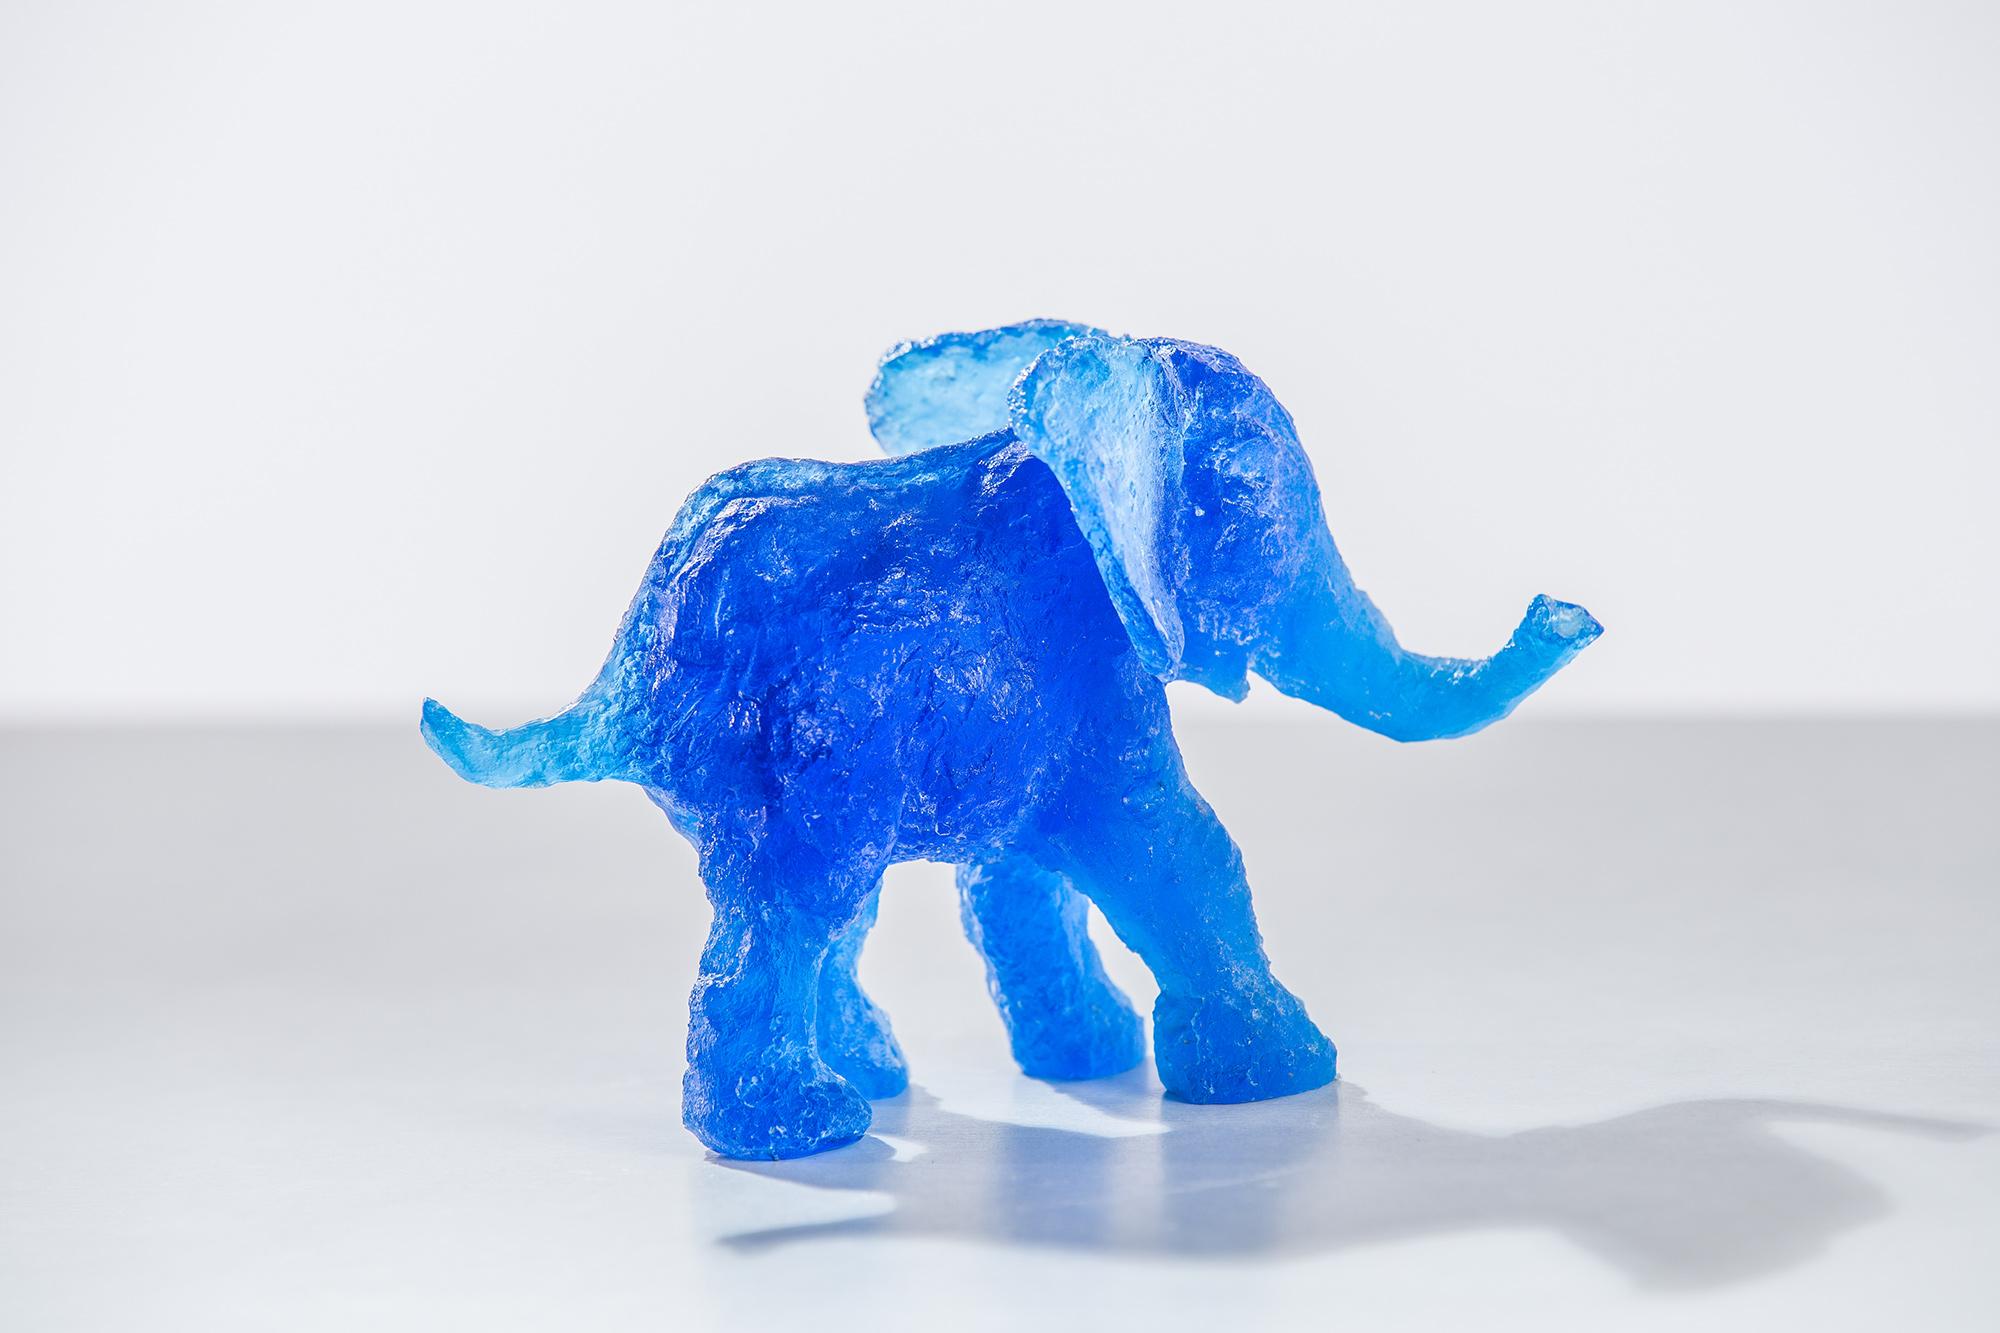 tamu der kleine blaue elefant tamu der kleine blaue elefant. Black Bedroom Furniture Sets. Home Design Ideas